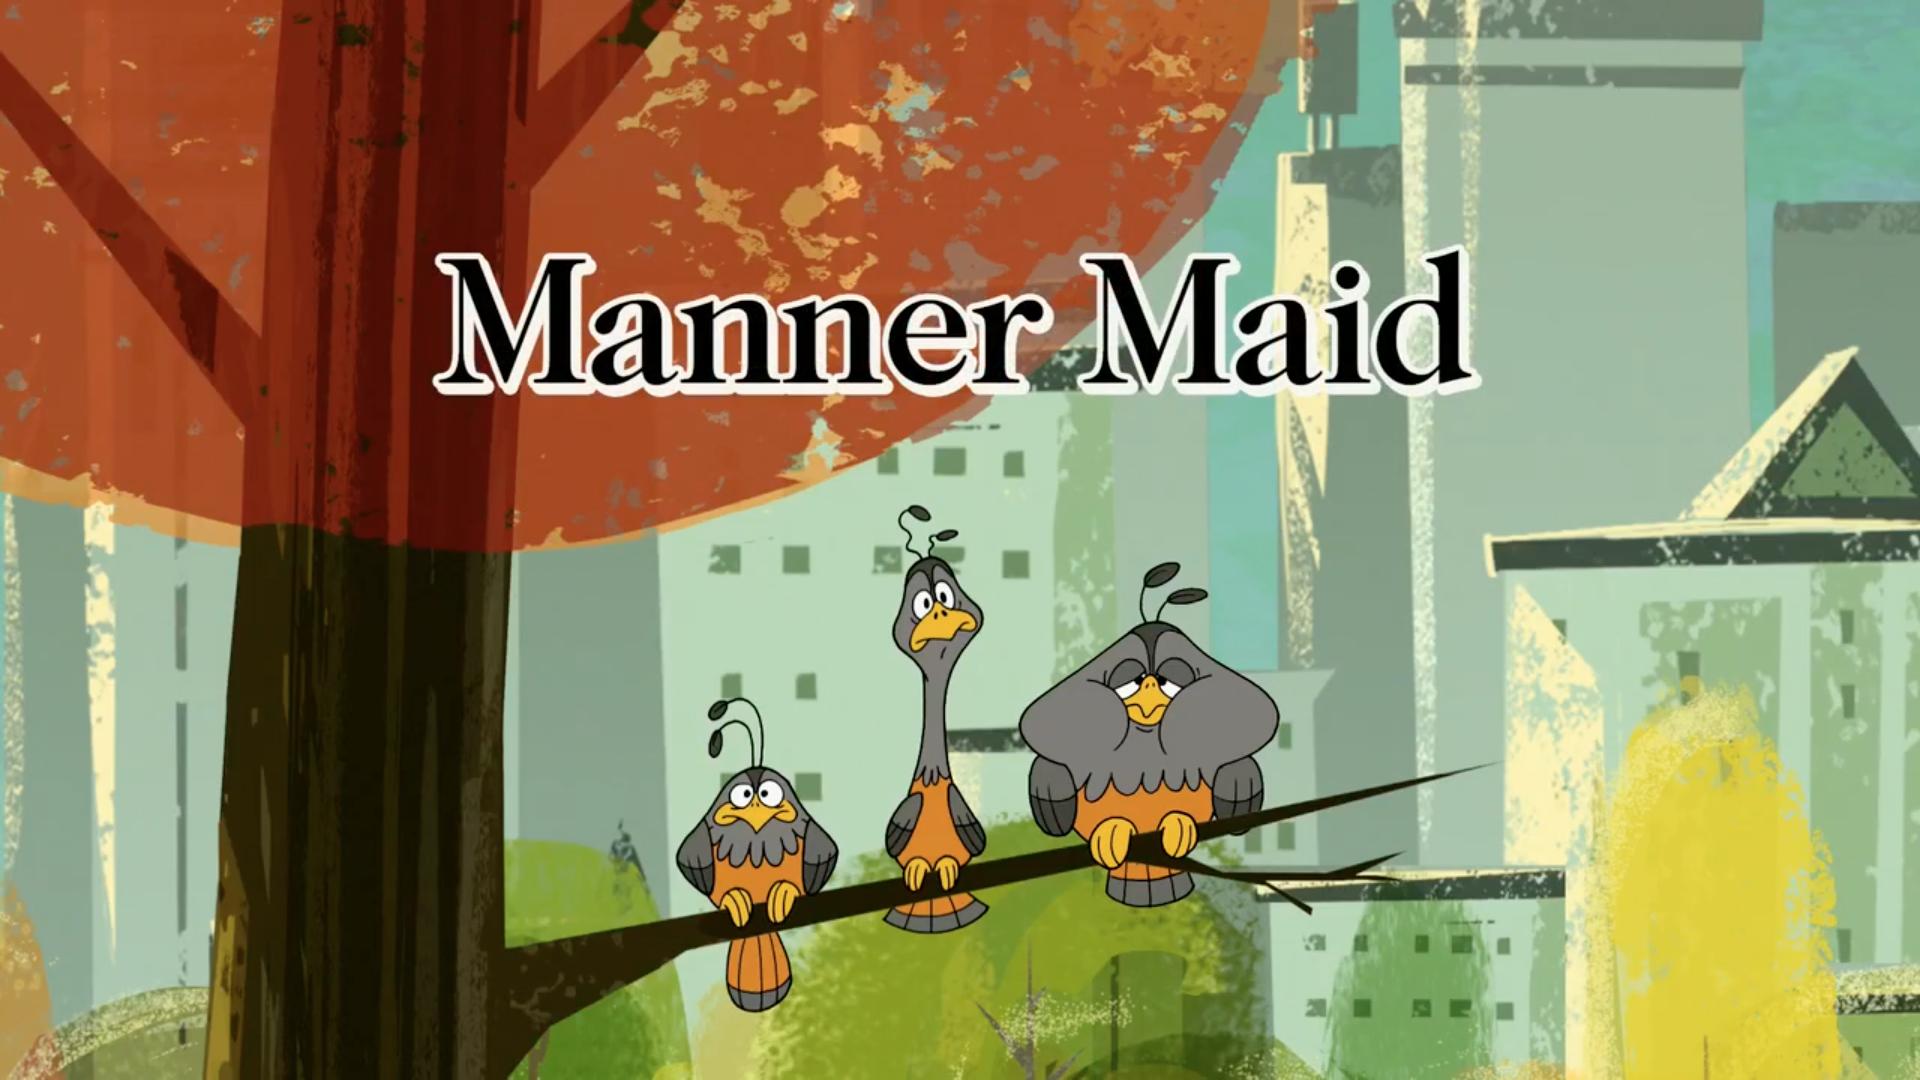 Manner Maid Wabbit Wiki Fandom Powered By Wikia